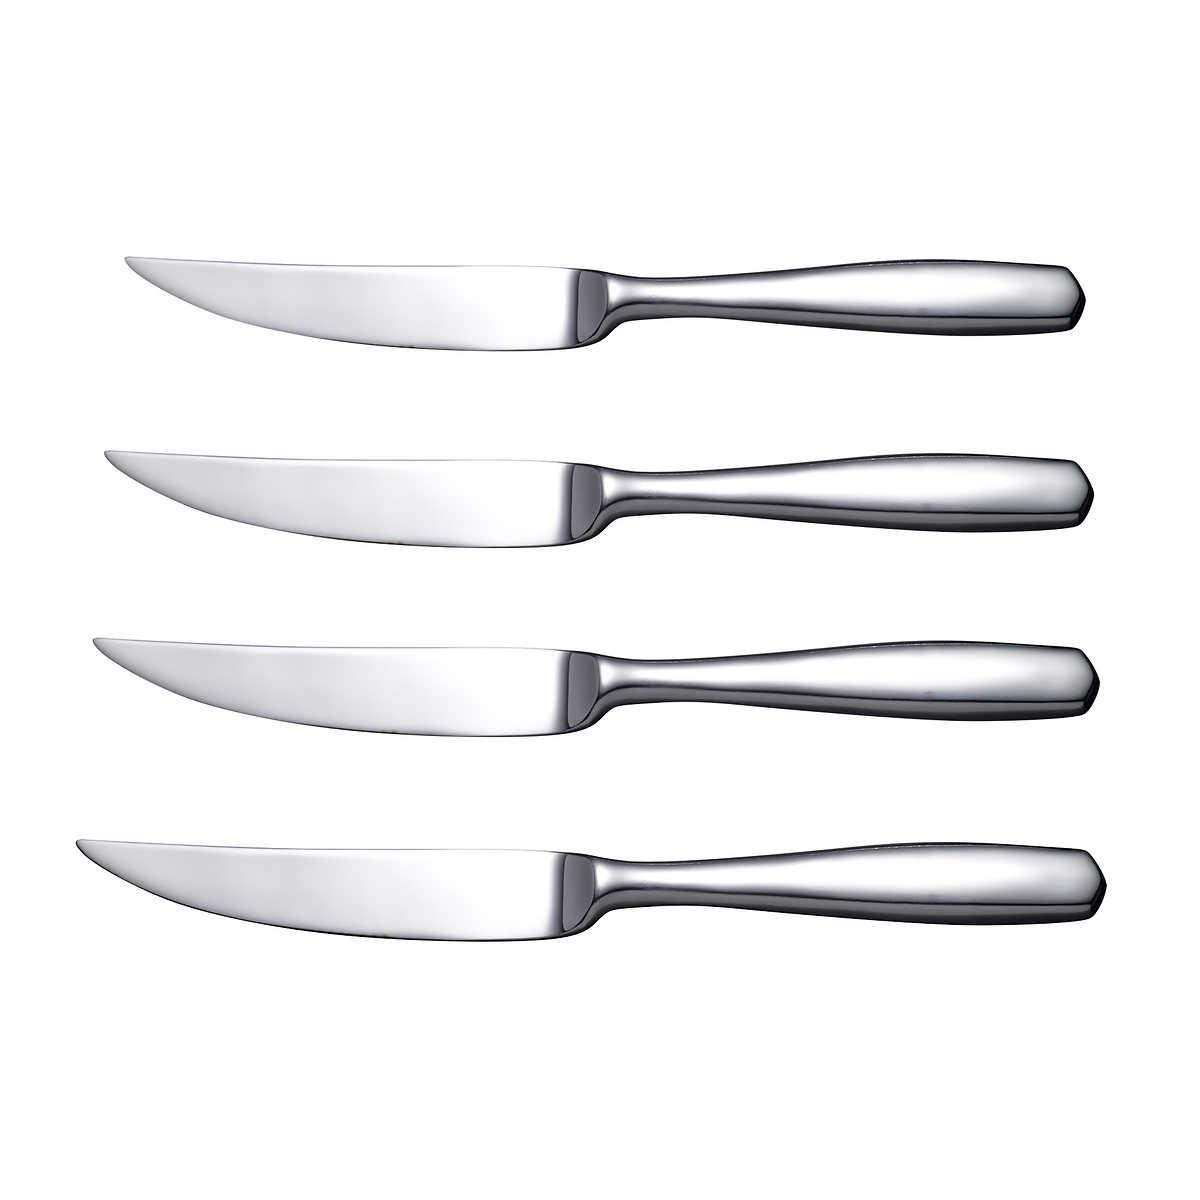 cutlery costco yamazaki amalfi 4 piece steak knife set